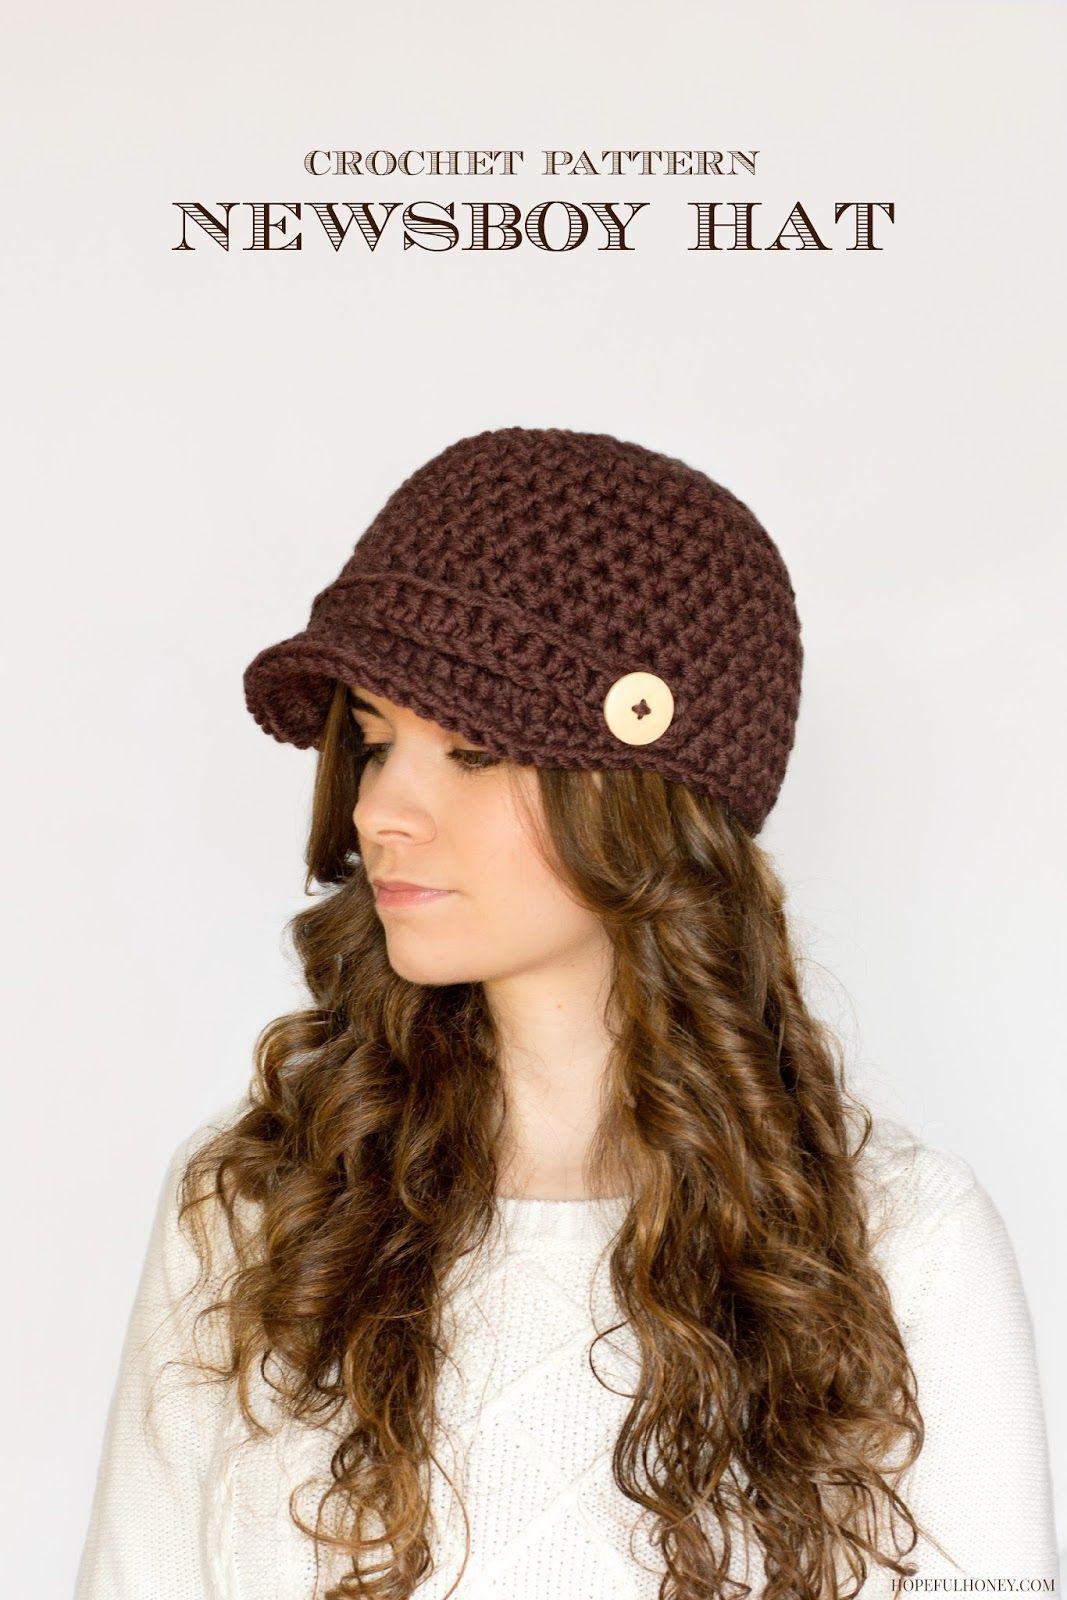 Crochet Hat Patterns Nifty Newsboy Hat Crochet Pattern Crochet Crochet Hats Crochet